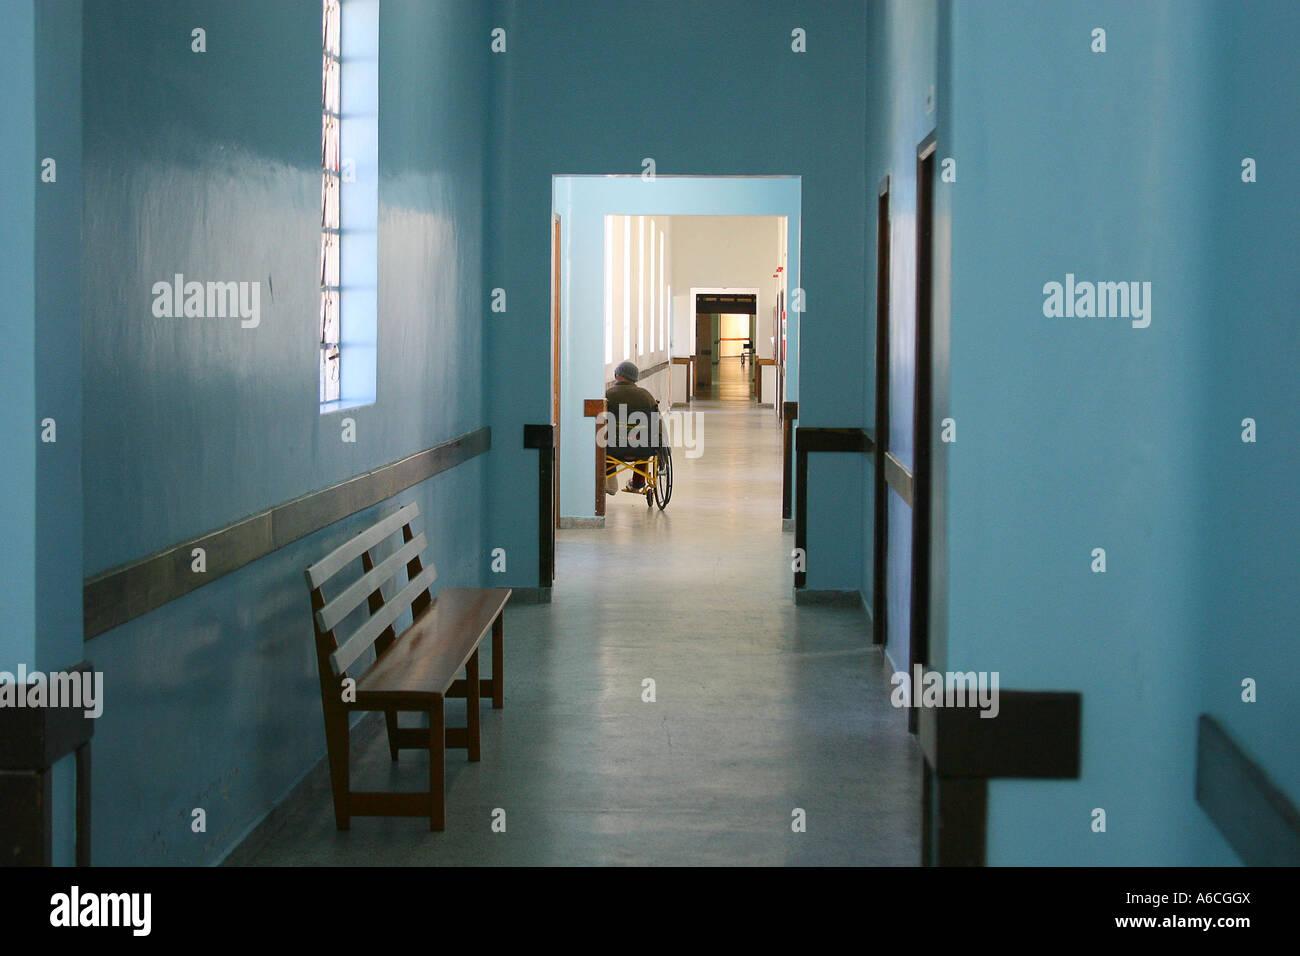 contagious disease hospital - Stock Image